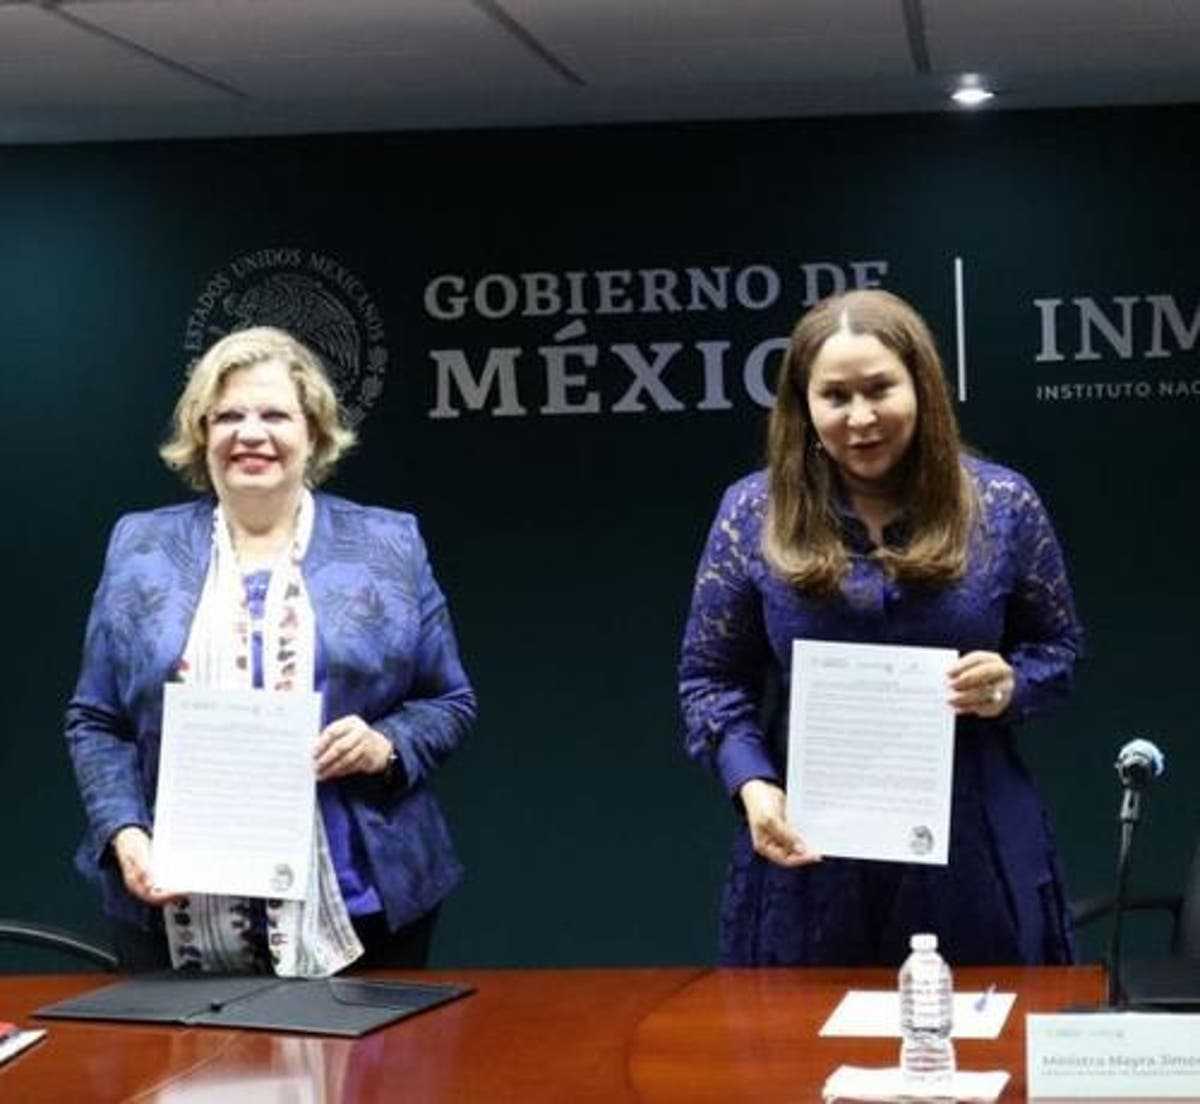 Ministerio de la Mujer suscribe acuerdo